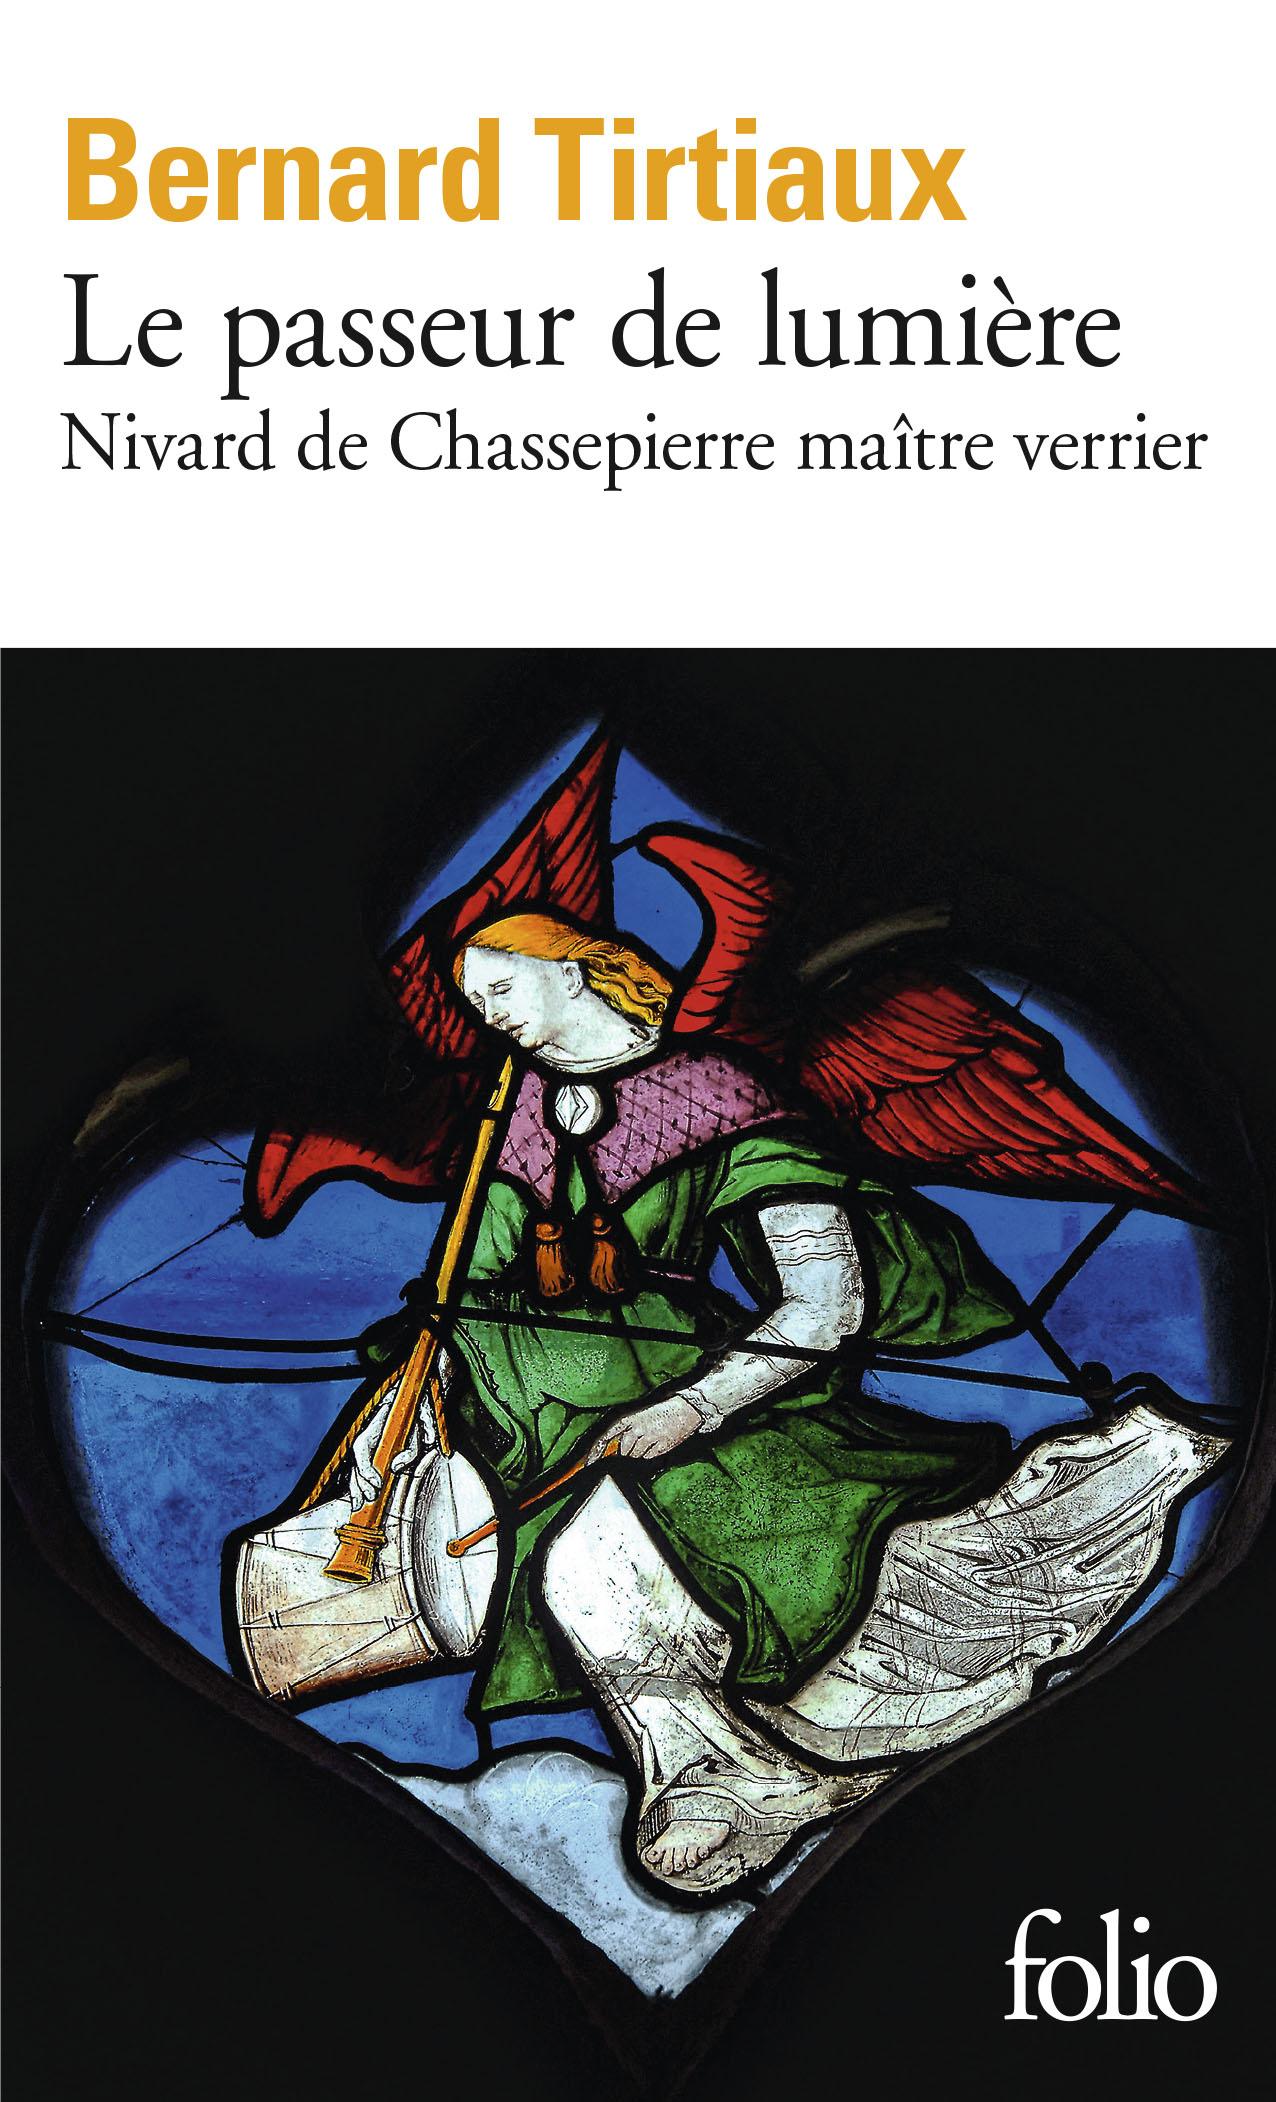 Le Passeur De Lumiere Folio Folio Gallimard Site Gallimard